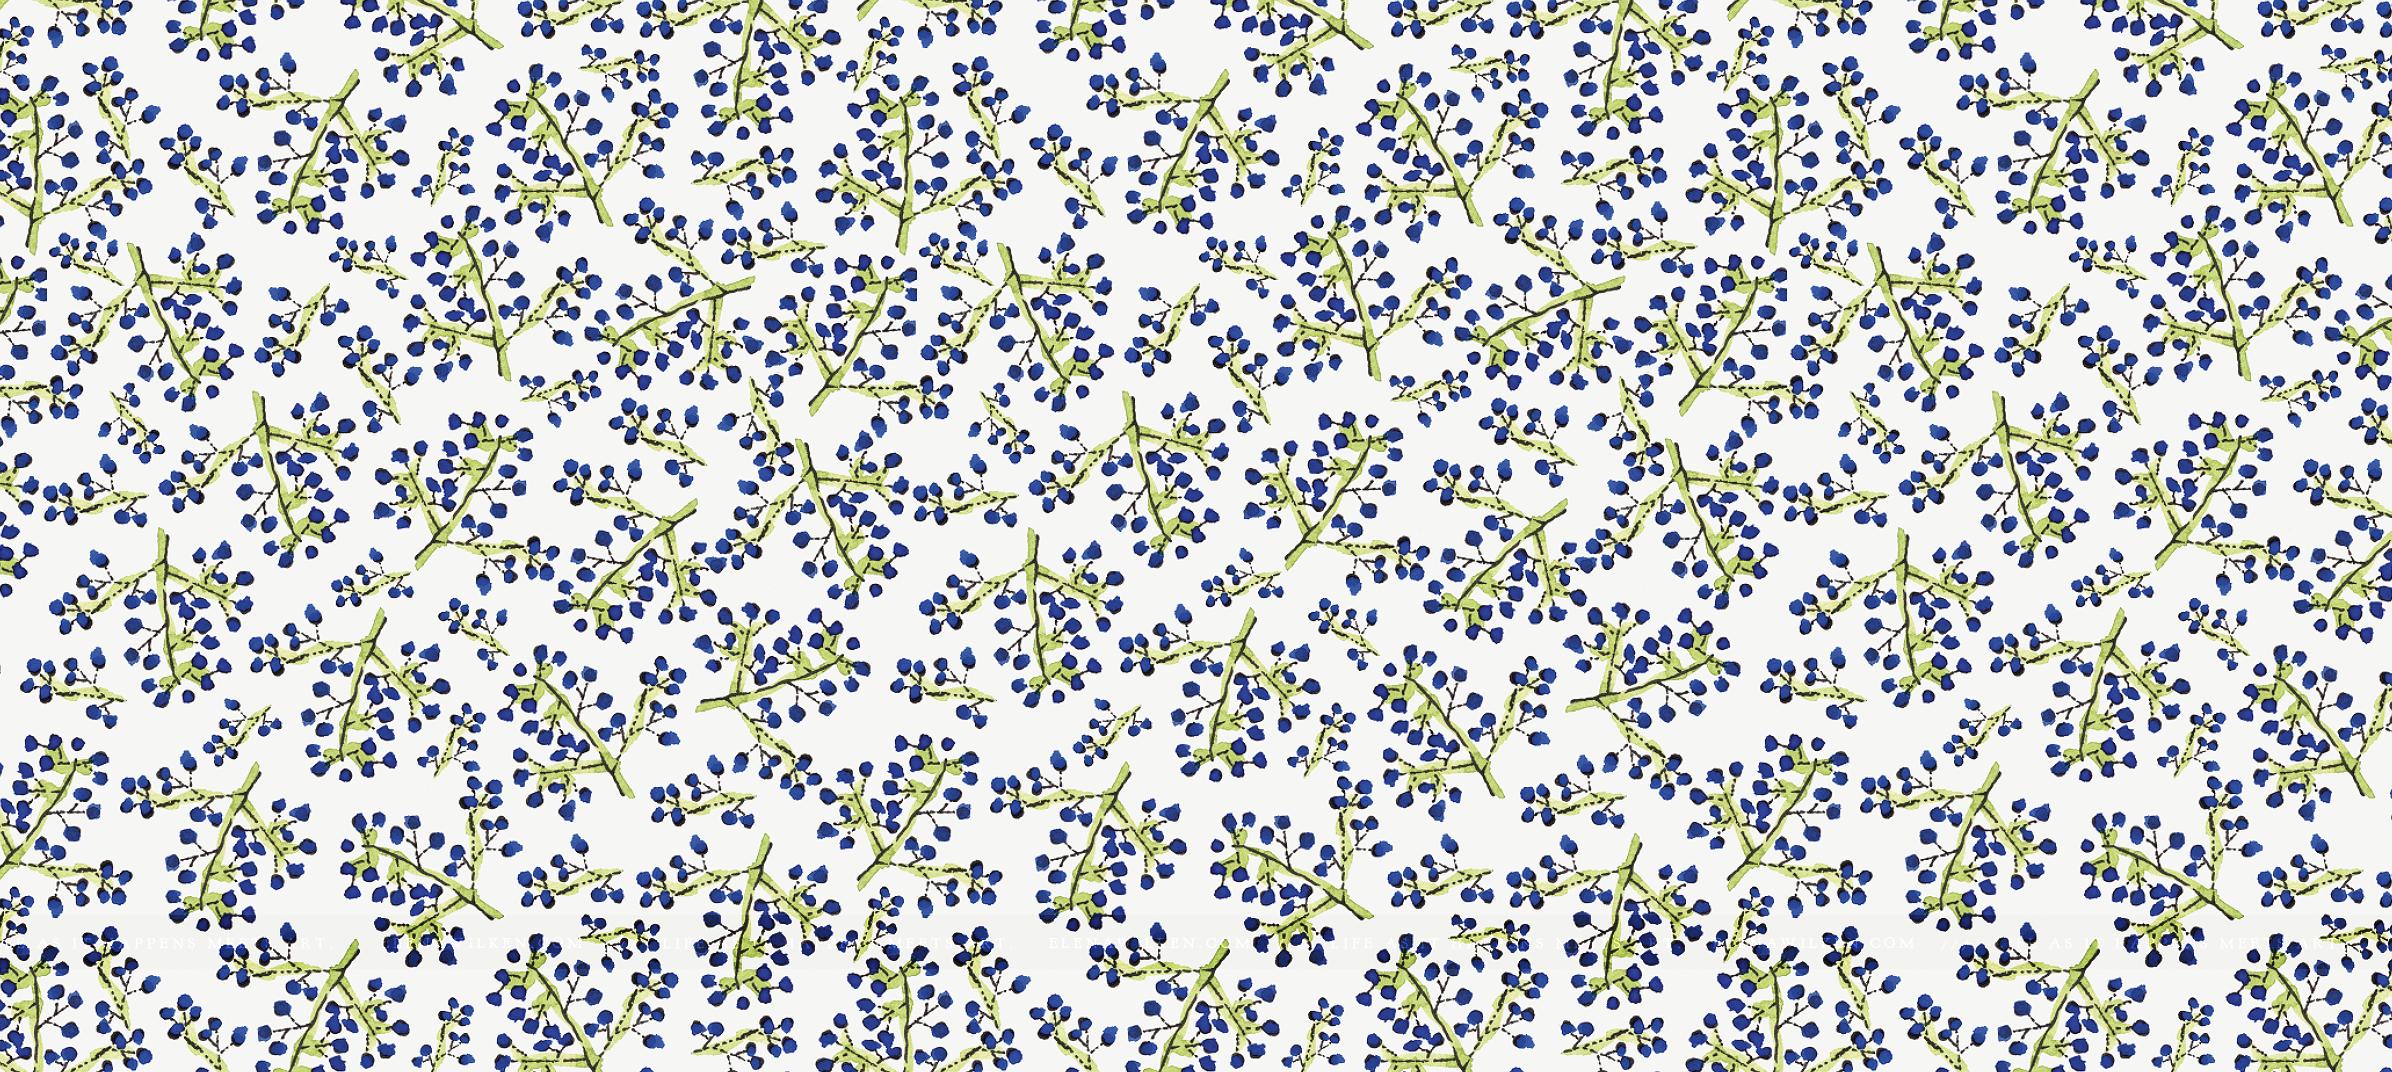 elena-wilken-whimsical-watercolor-fields-surface-pattern-design4.png